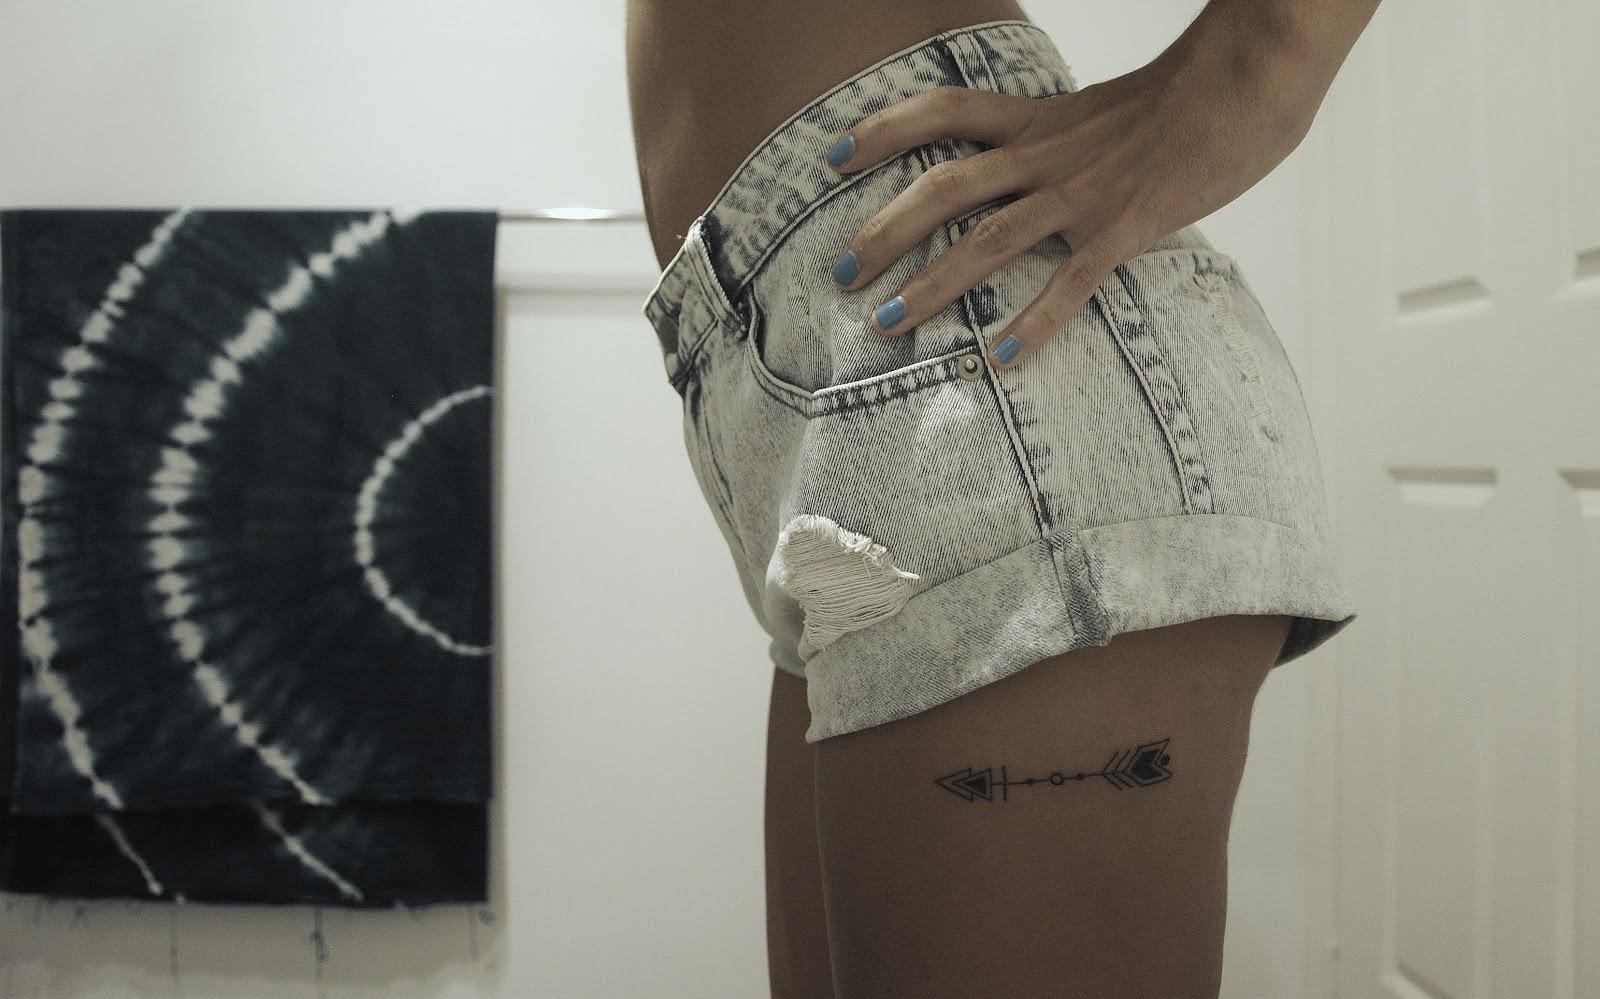 arrow tattoo. Black Bedroom Furniture Sets. Home Design Ideas